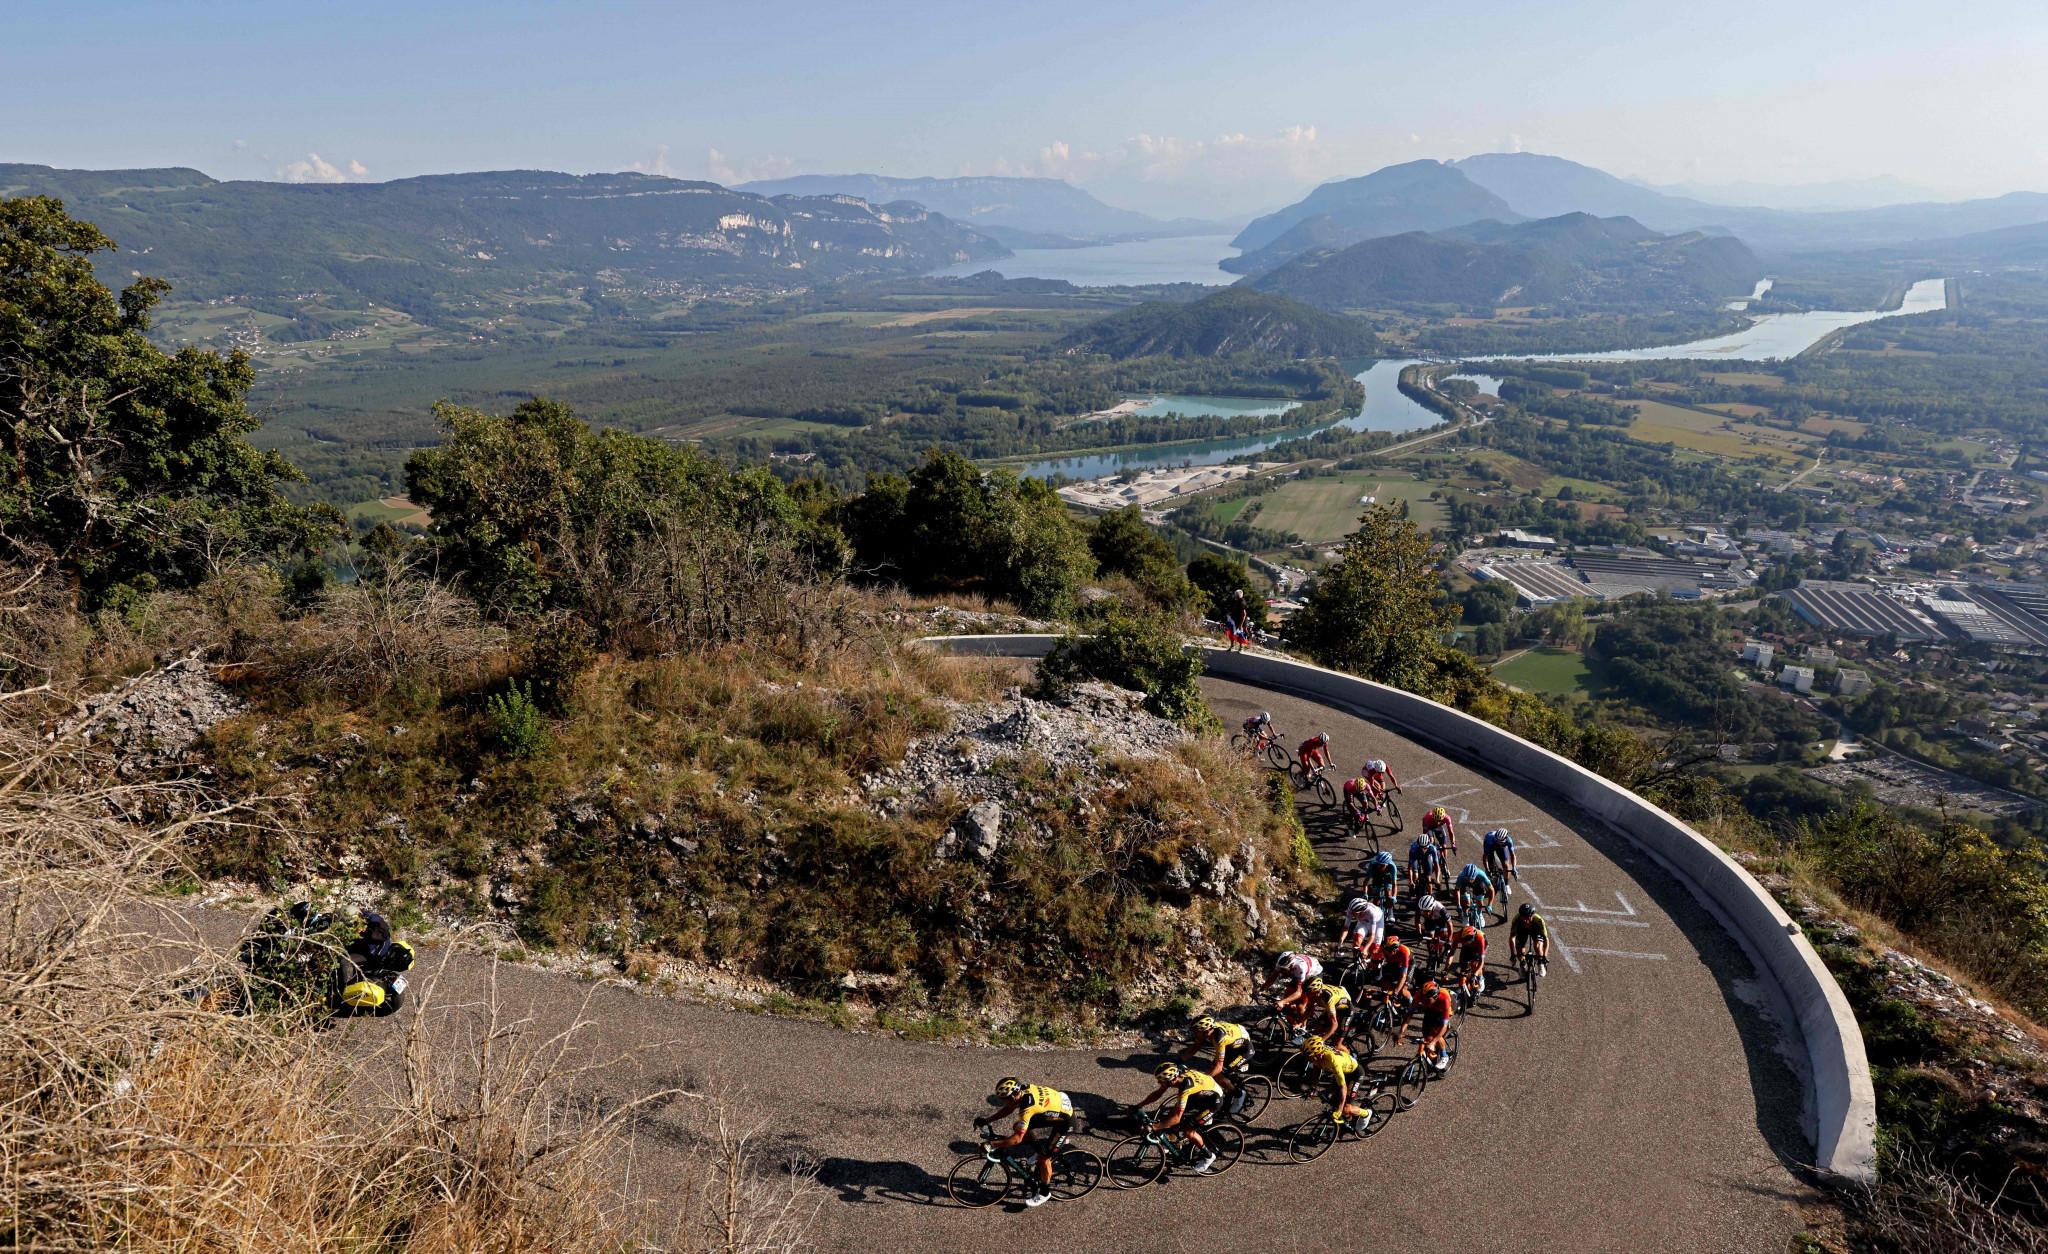 Jumbo-Visma set a tough pace on the climb to aid race leader Primož Roglič ©Getty Images